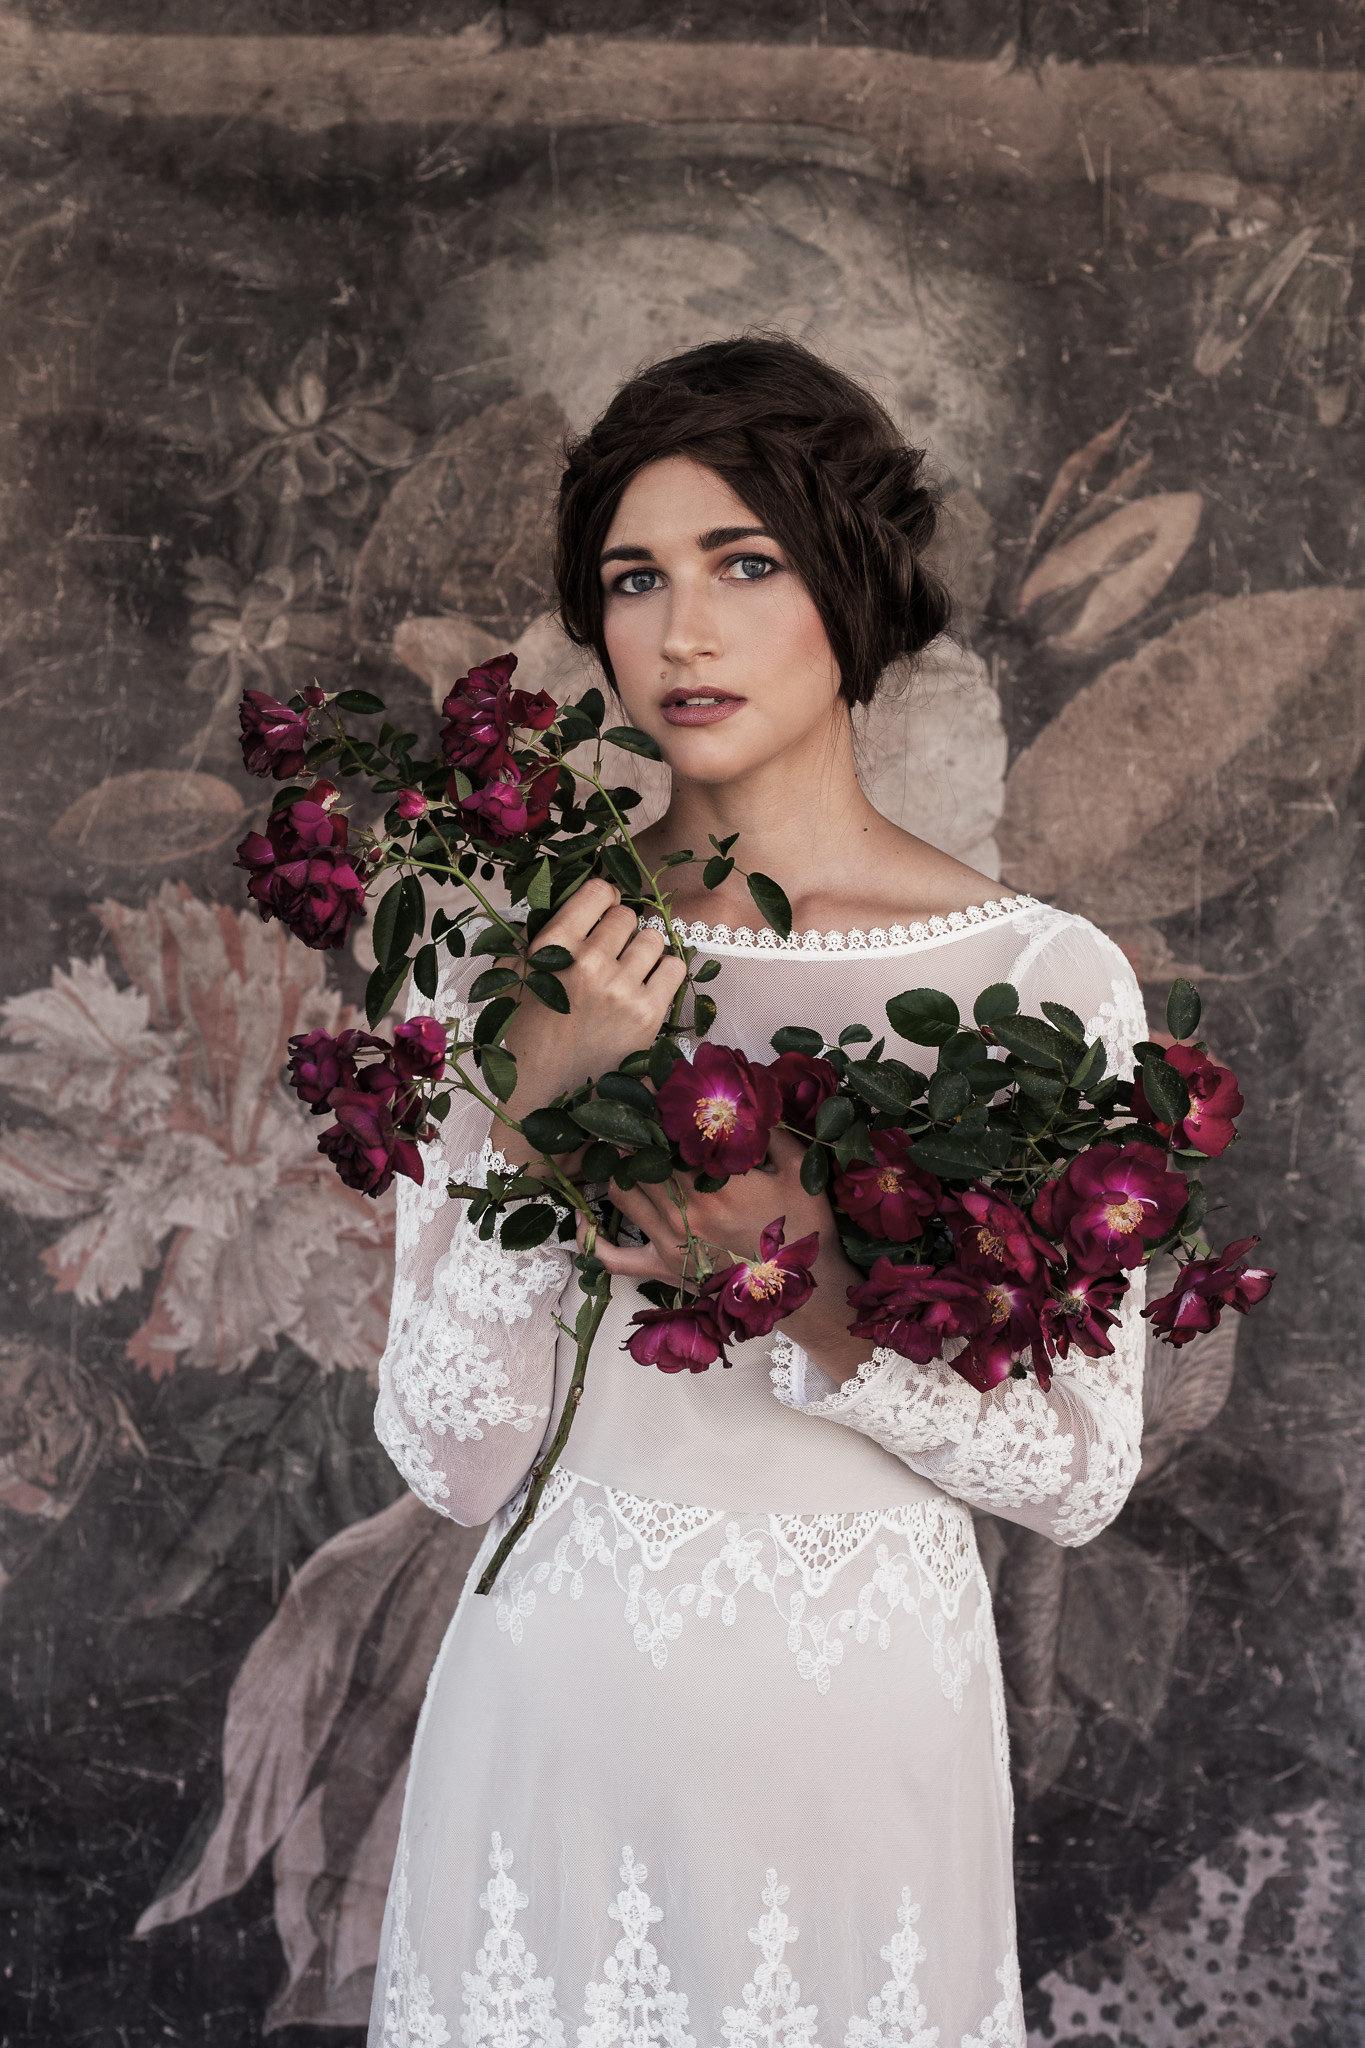 bohemian-wedding-inspiration-featuring-lisa-long-sleeve-lace-wedding-dress